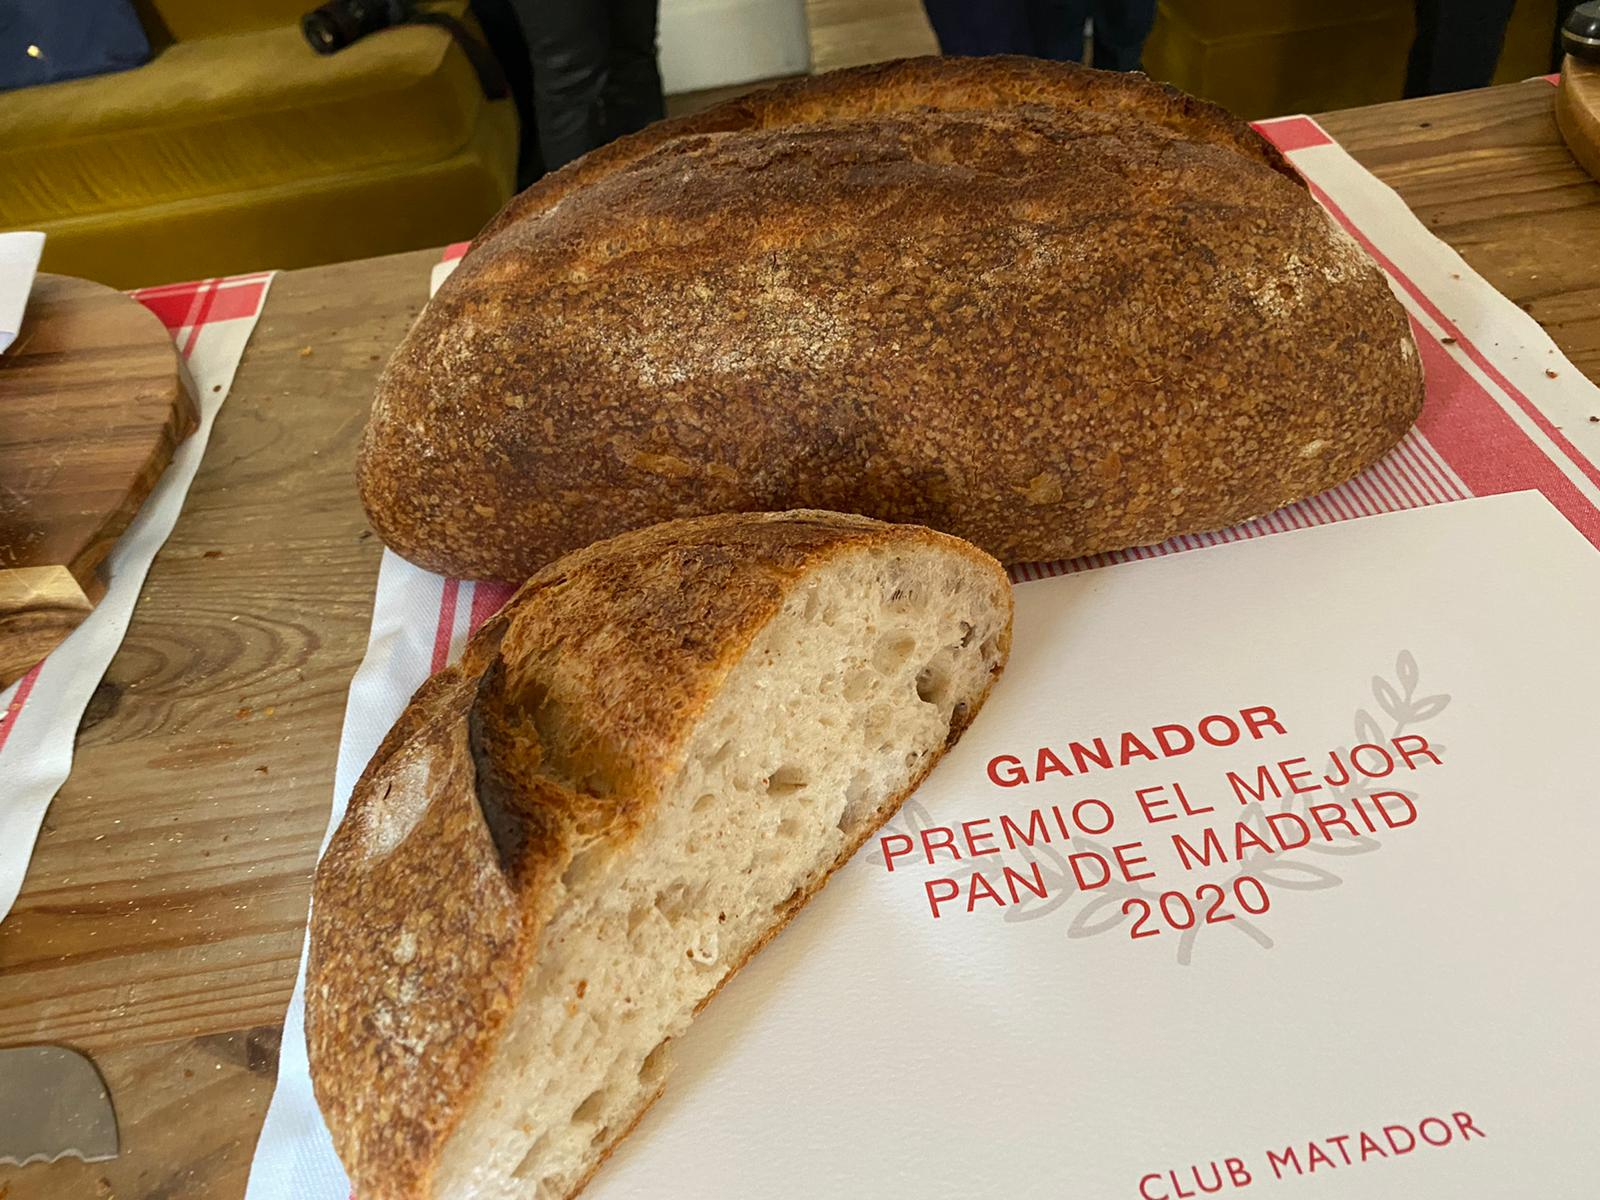 MEJOR PAN DE MADRID 2020